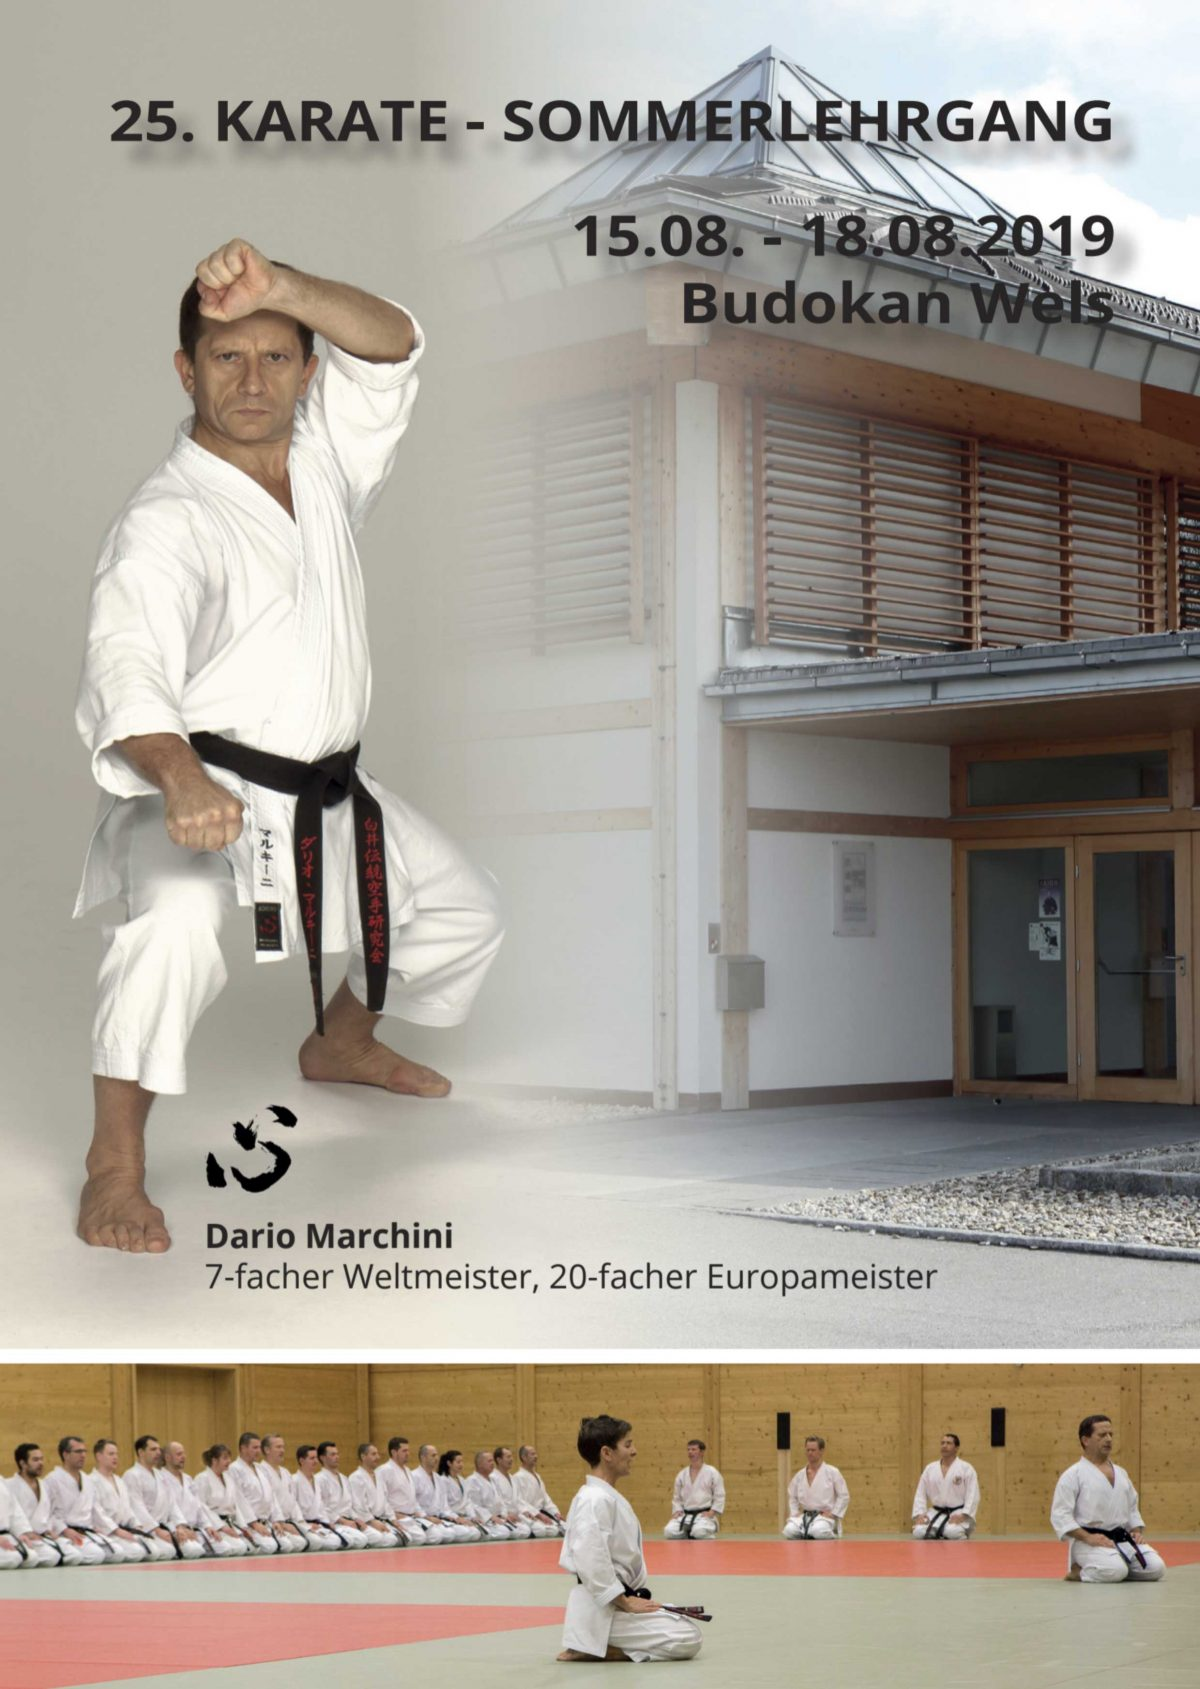 Austria Karatedo Kunren 2019: 25. Karate – Sommerlehrgang – Budokan Wels